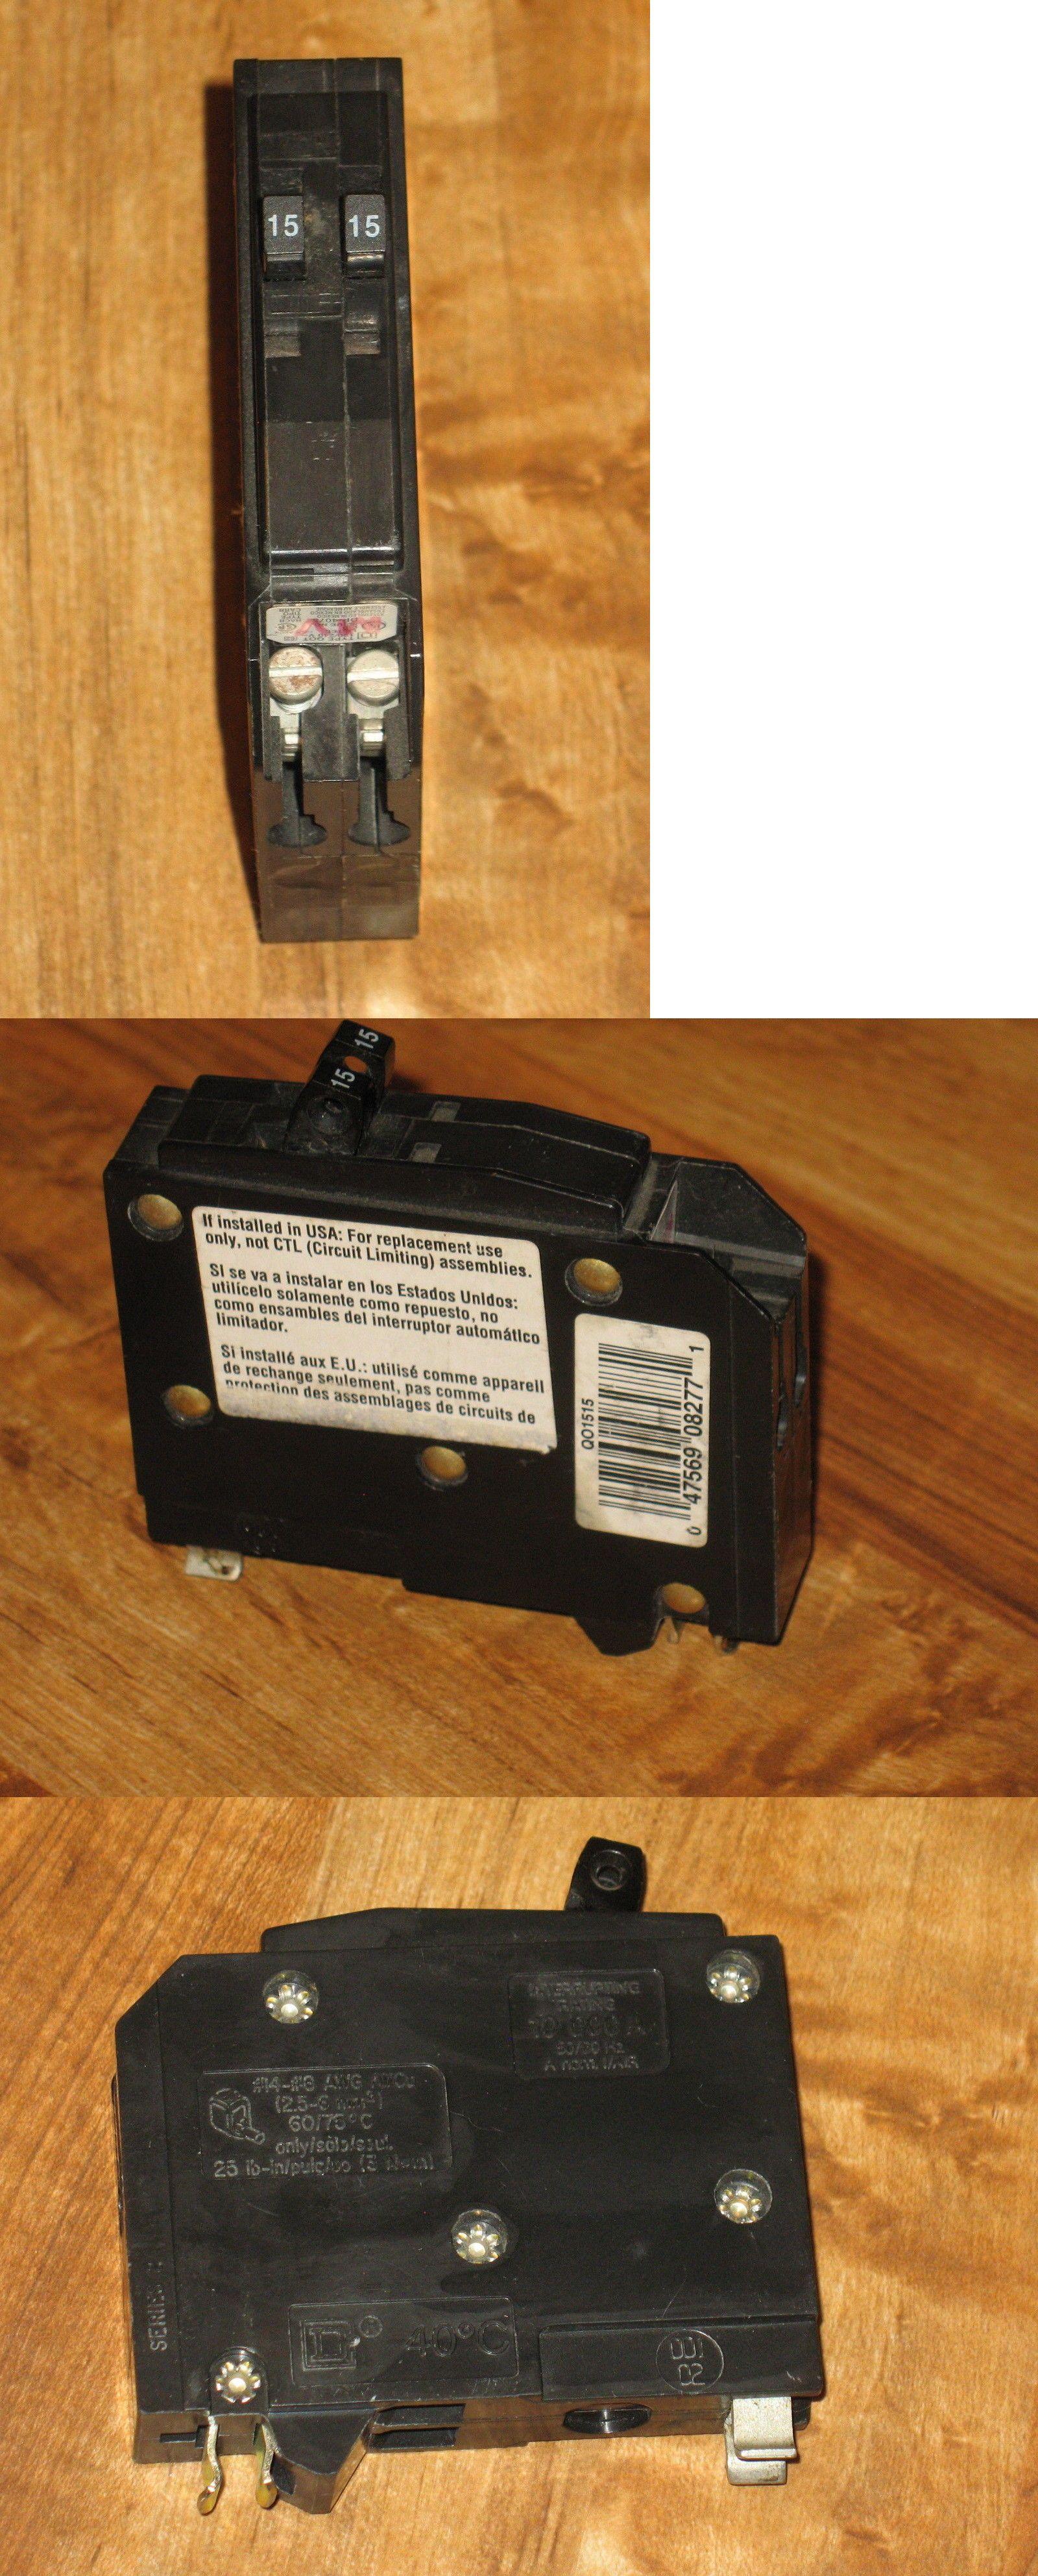 Fuse Box Ebay on layout for hexagonal box, transformer box, generator box, tube box, ground box, breaker box, style box, power box, circuit box, meter box, dark box, the last of us box, relay box, switch box, junction box, watch dogs box, cover box, case box, four box, clip box,